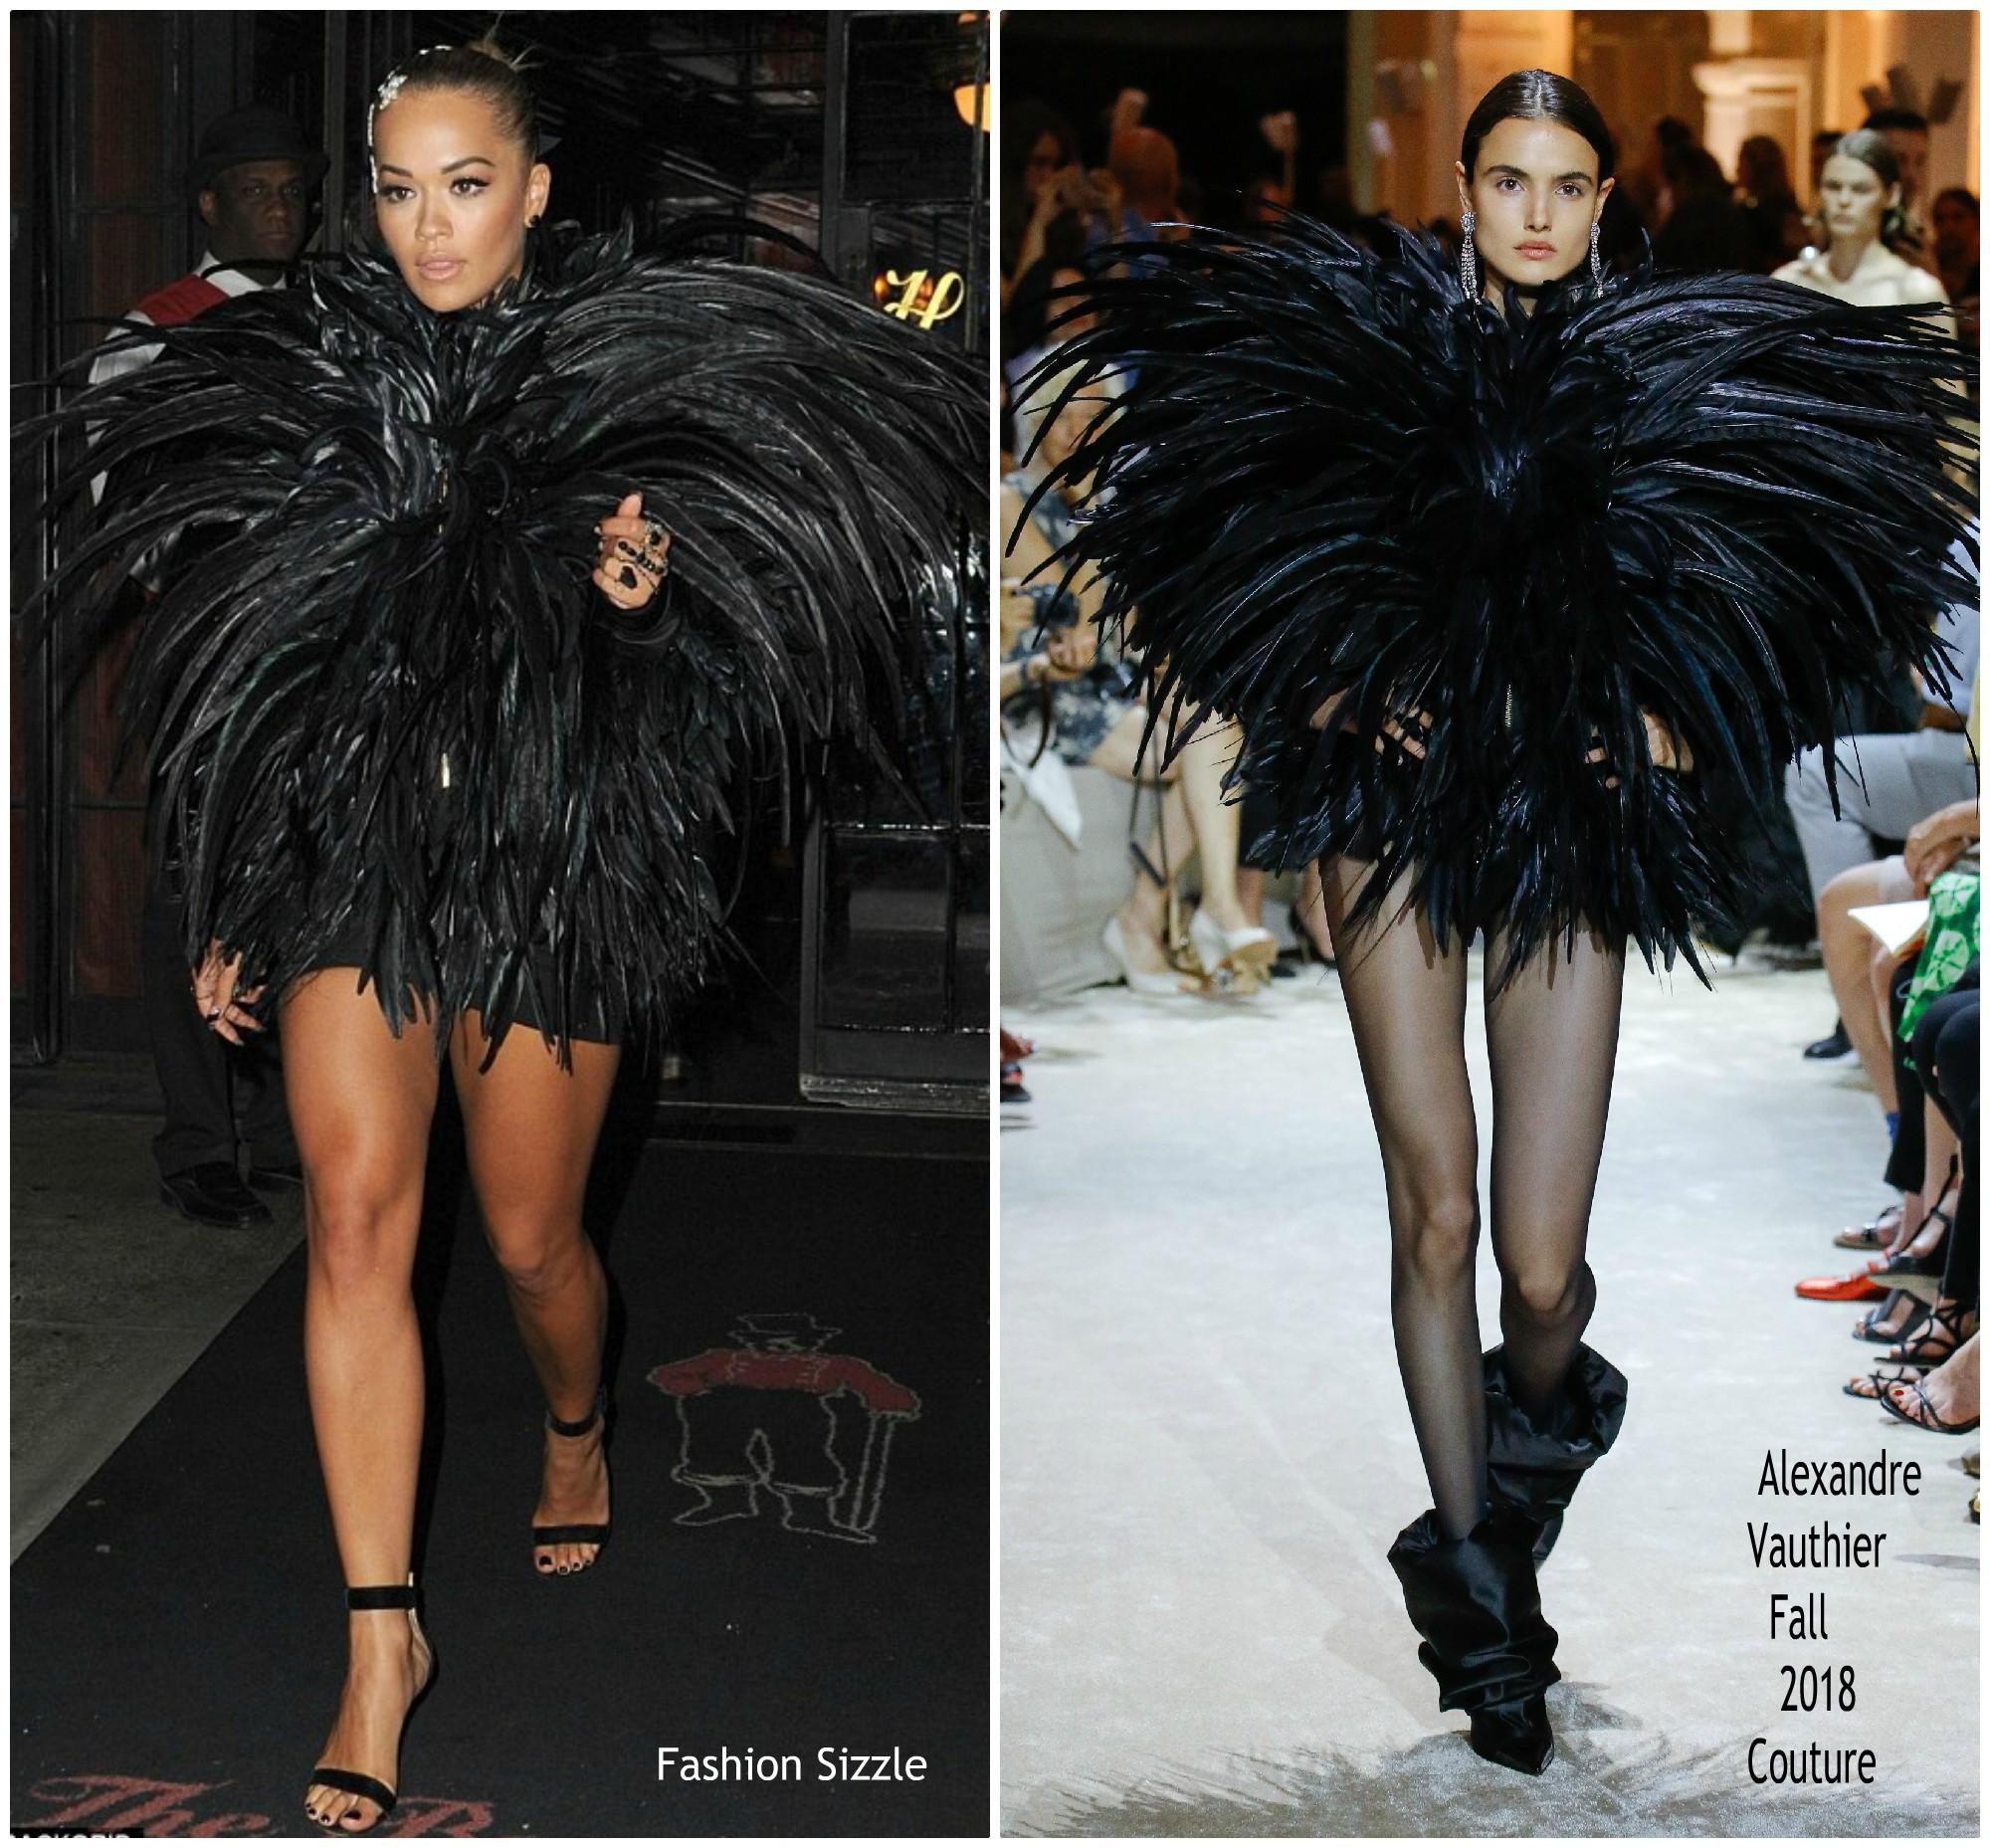 rita-ora-in-alexandre-vauthier-haute-couture-jennifer-lopezs-mtv-vmas-vanguard-award-celebration-afterparty